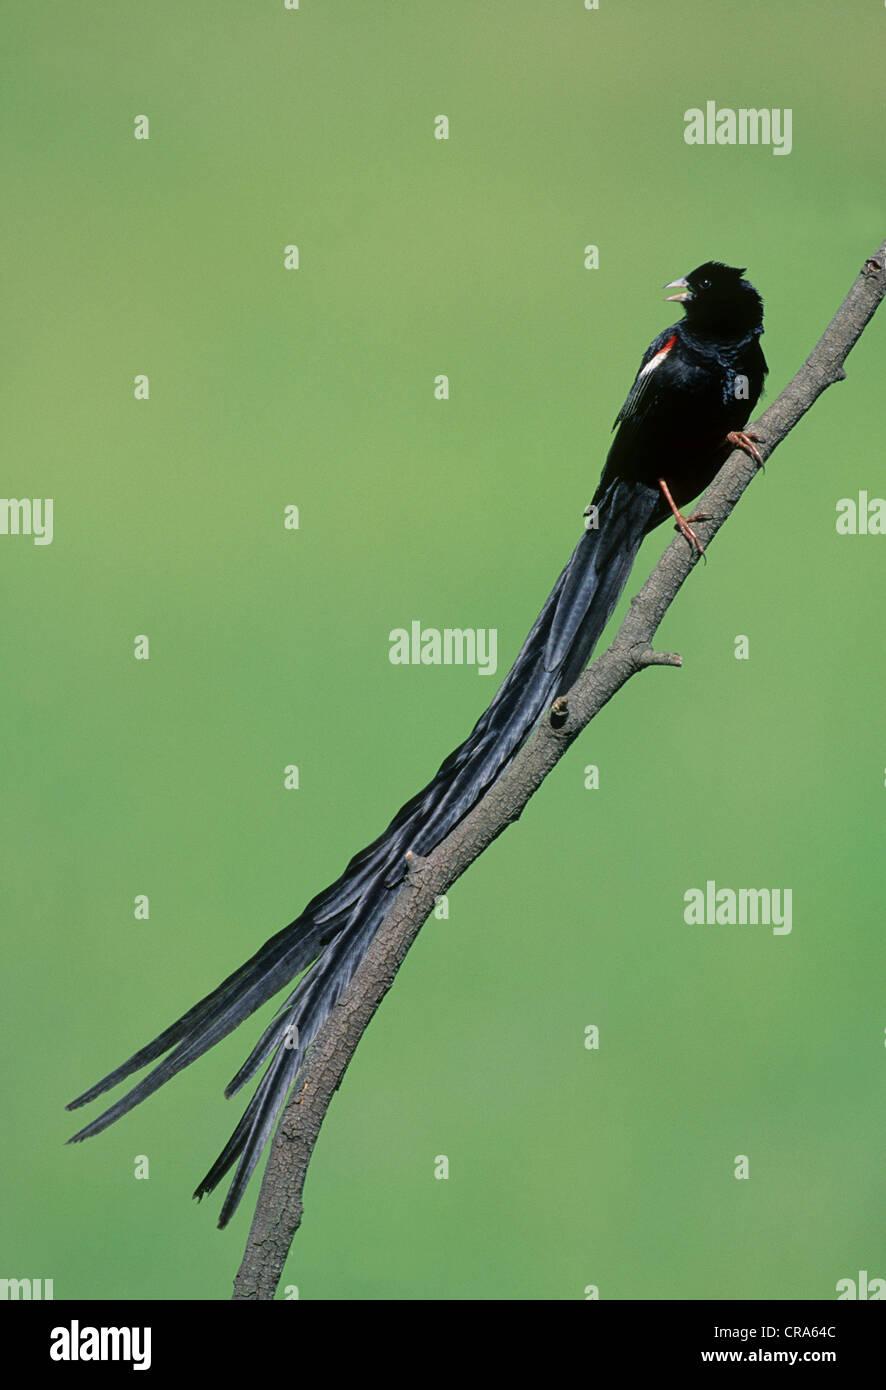 Long-tailed Widowbird (Euplectes progne), Midmar Nature Reserve, KwaZulu-Natal, South Africa, Africa - Stock Image